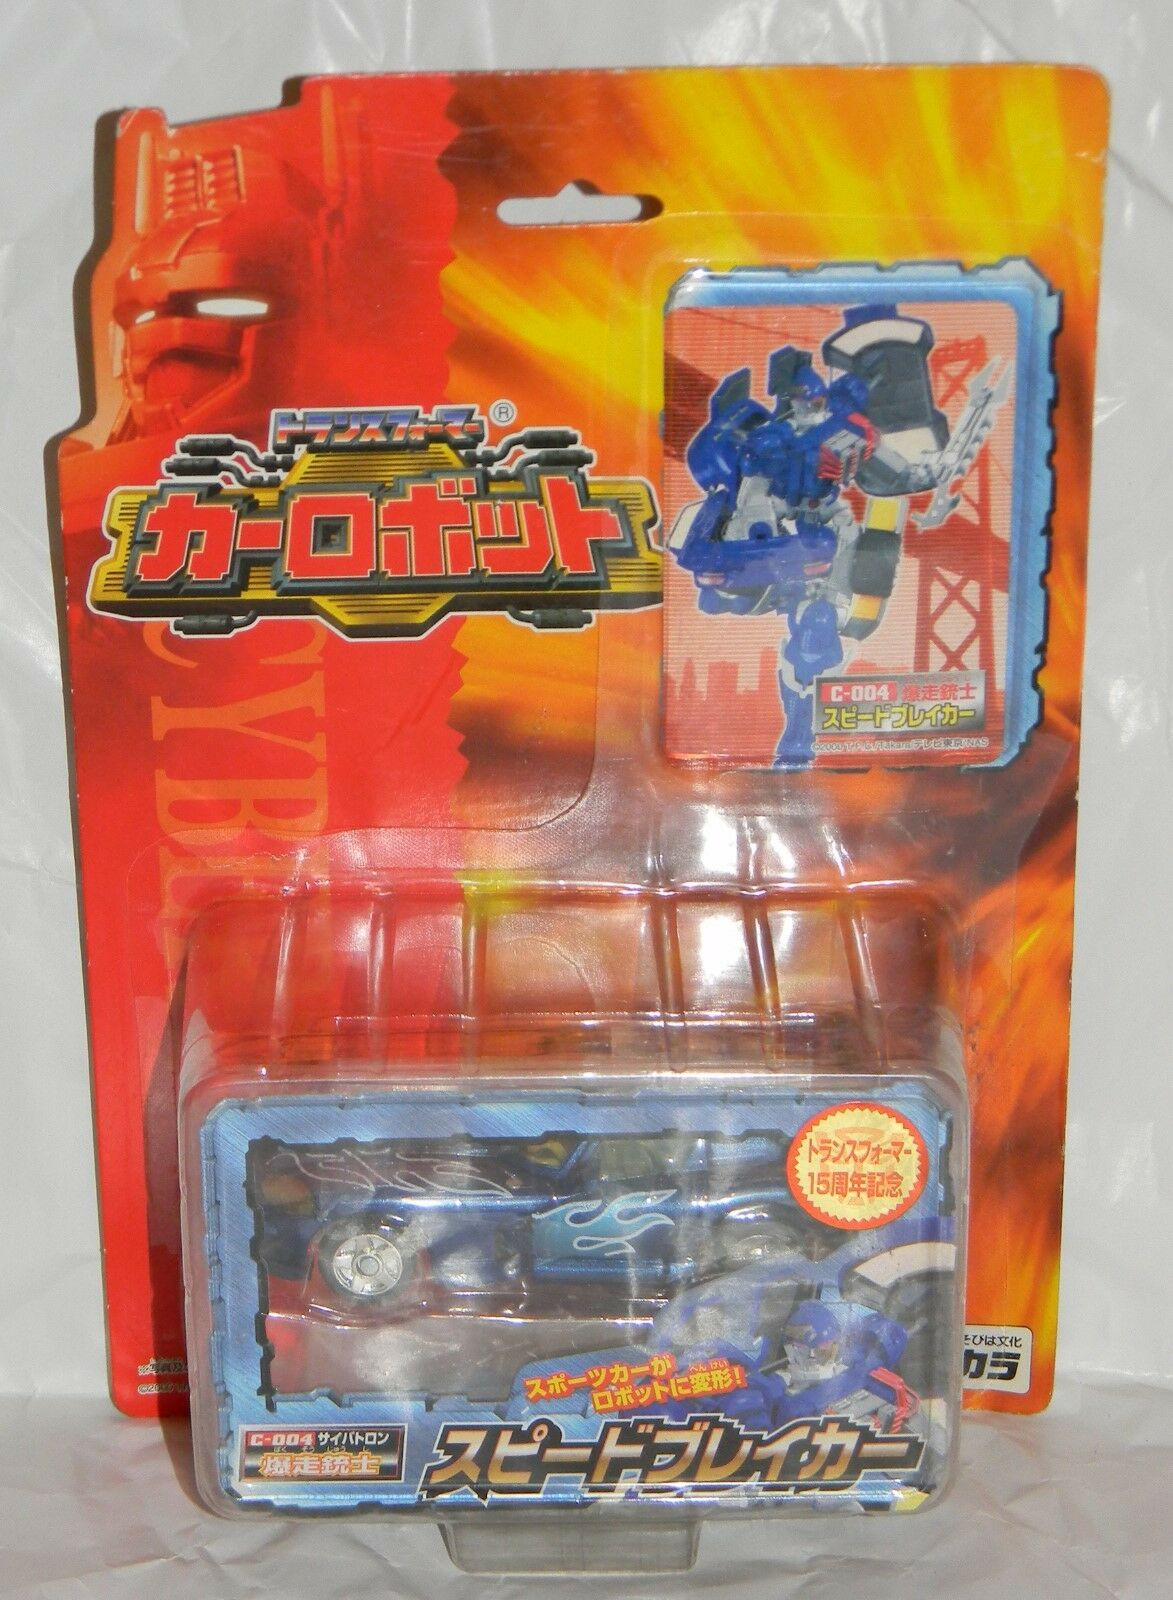 Transformers Japanese Robo Power Activators Sideburn Action Figure C-004 -RARE